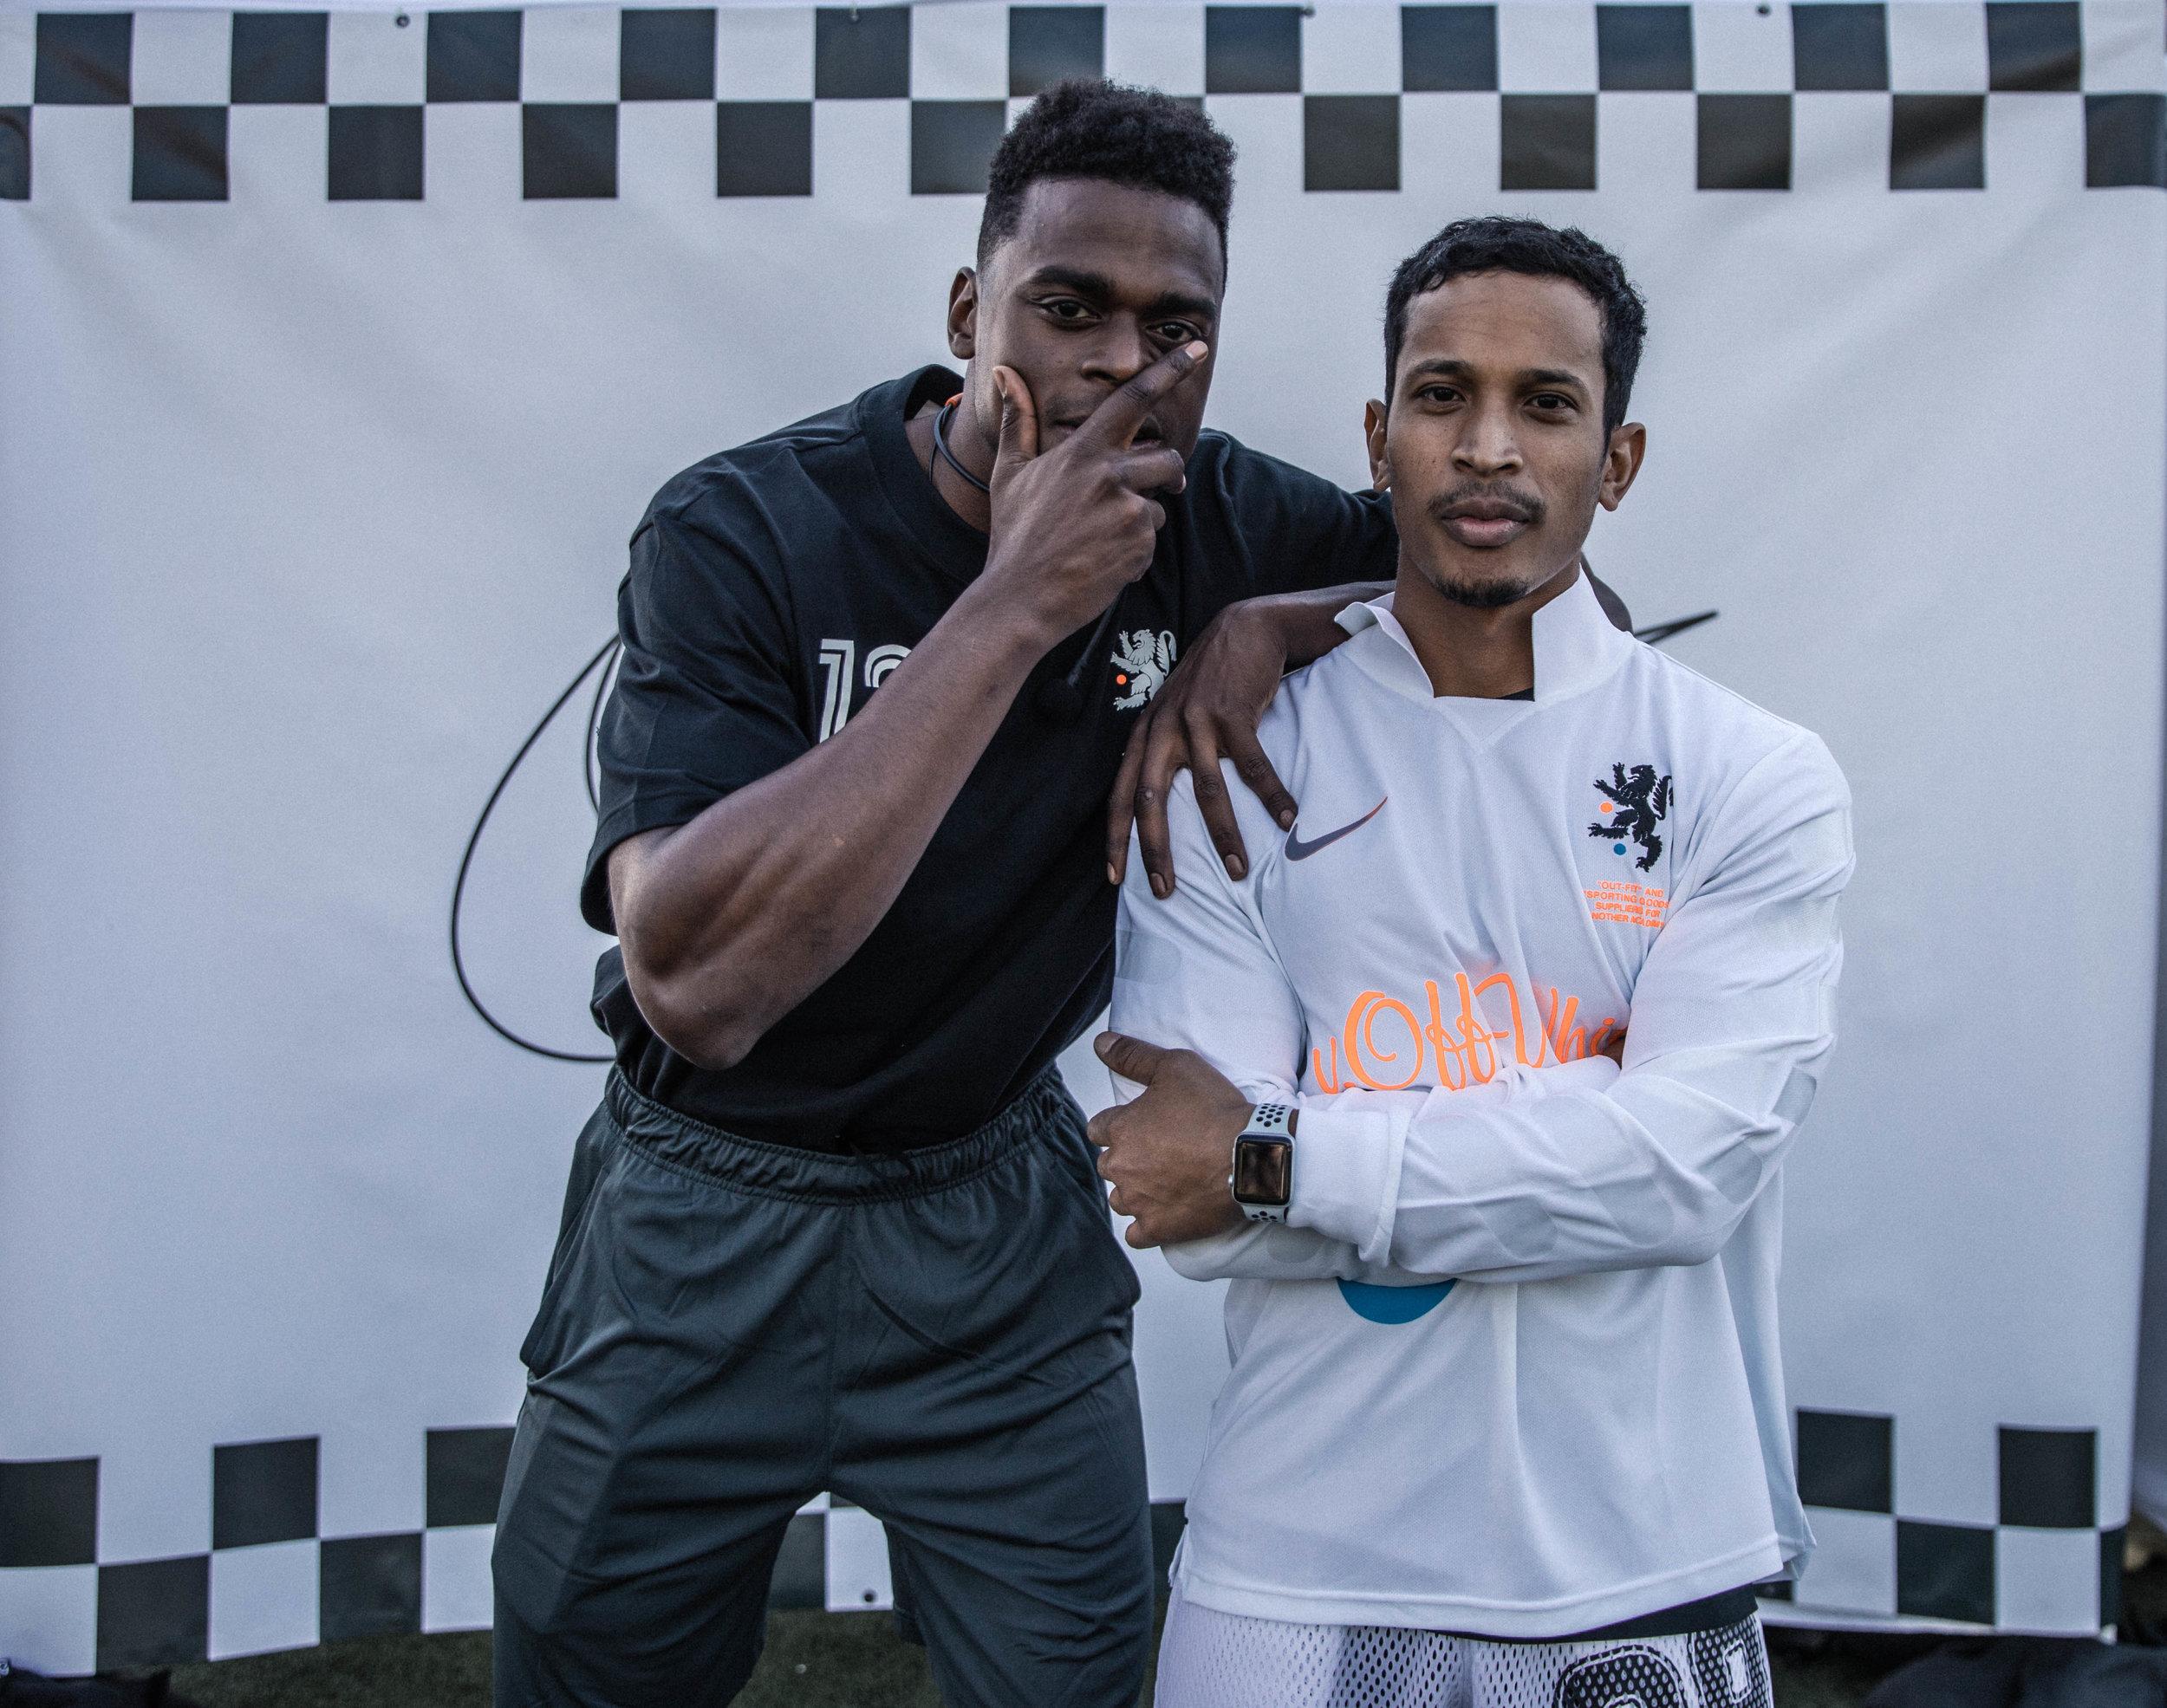 Football_Mon_Amour_Nike_NYC_15.jpg